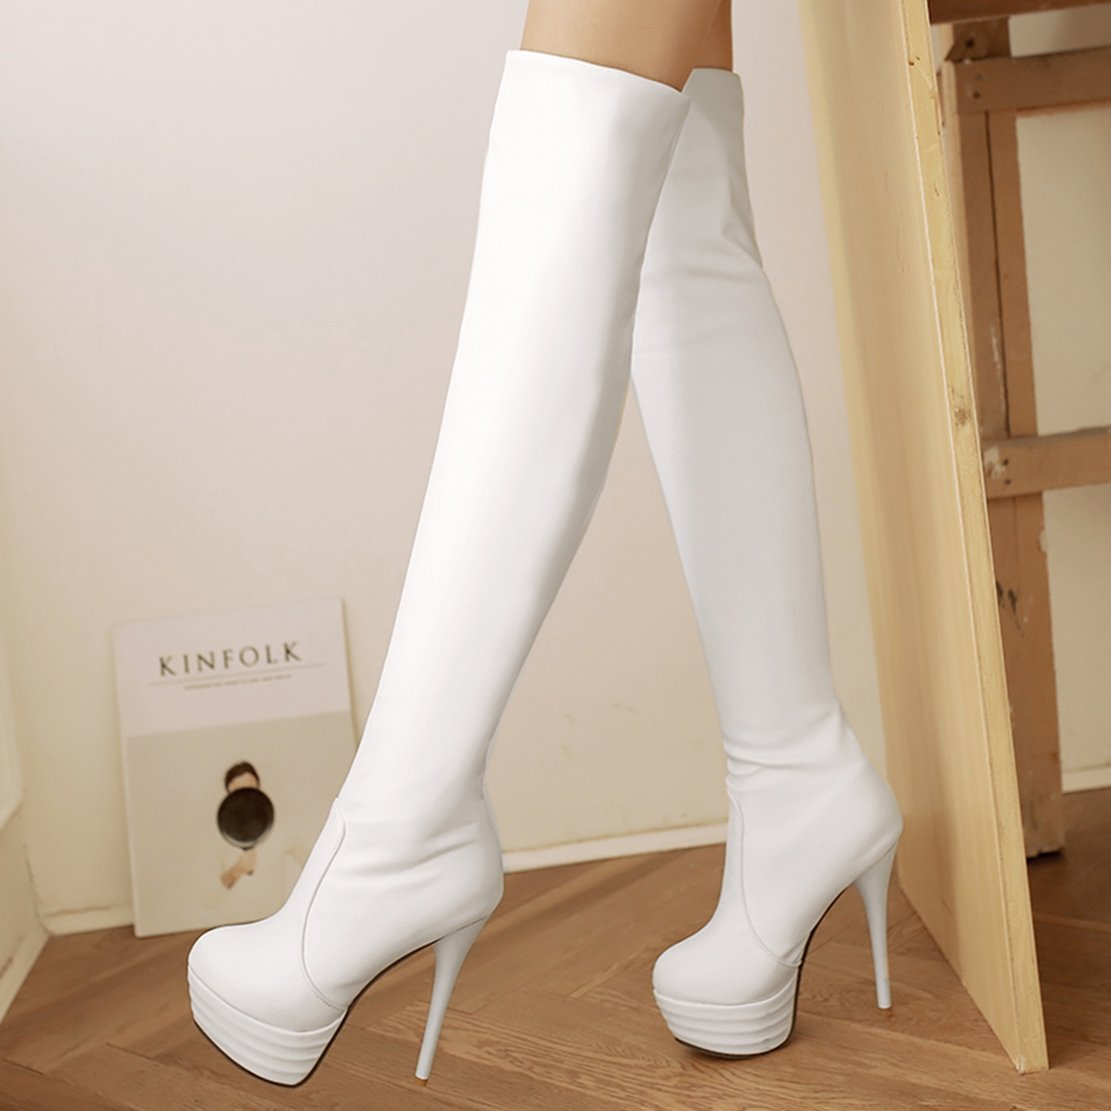 AIYOUMEI Damen Stretch Overknee Stiefel Heels mit Plateau Stiletto High Heels Stiefel Langschaft Stiefel Schuhe Weiß e51e59